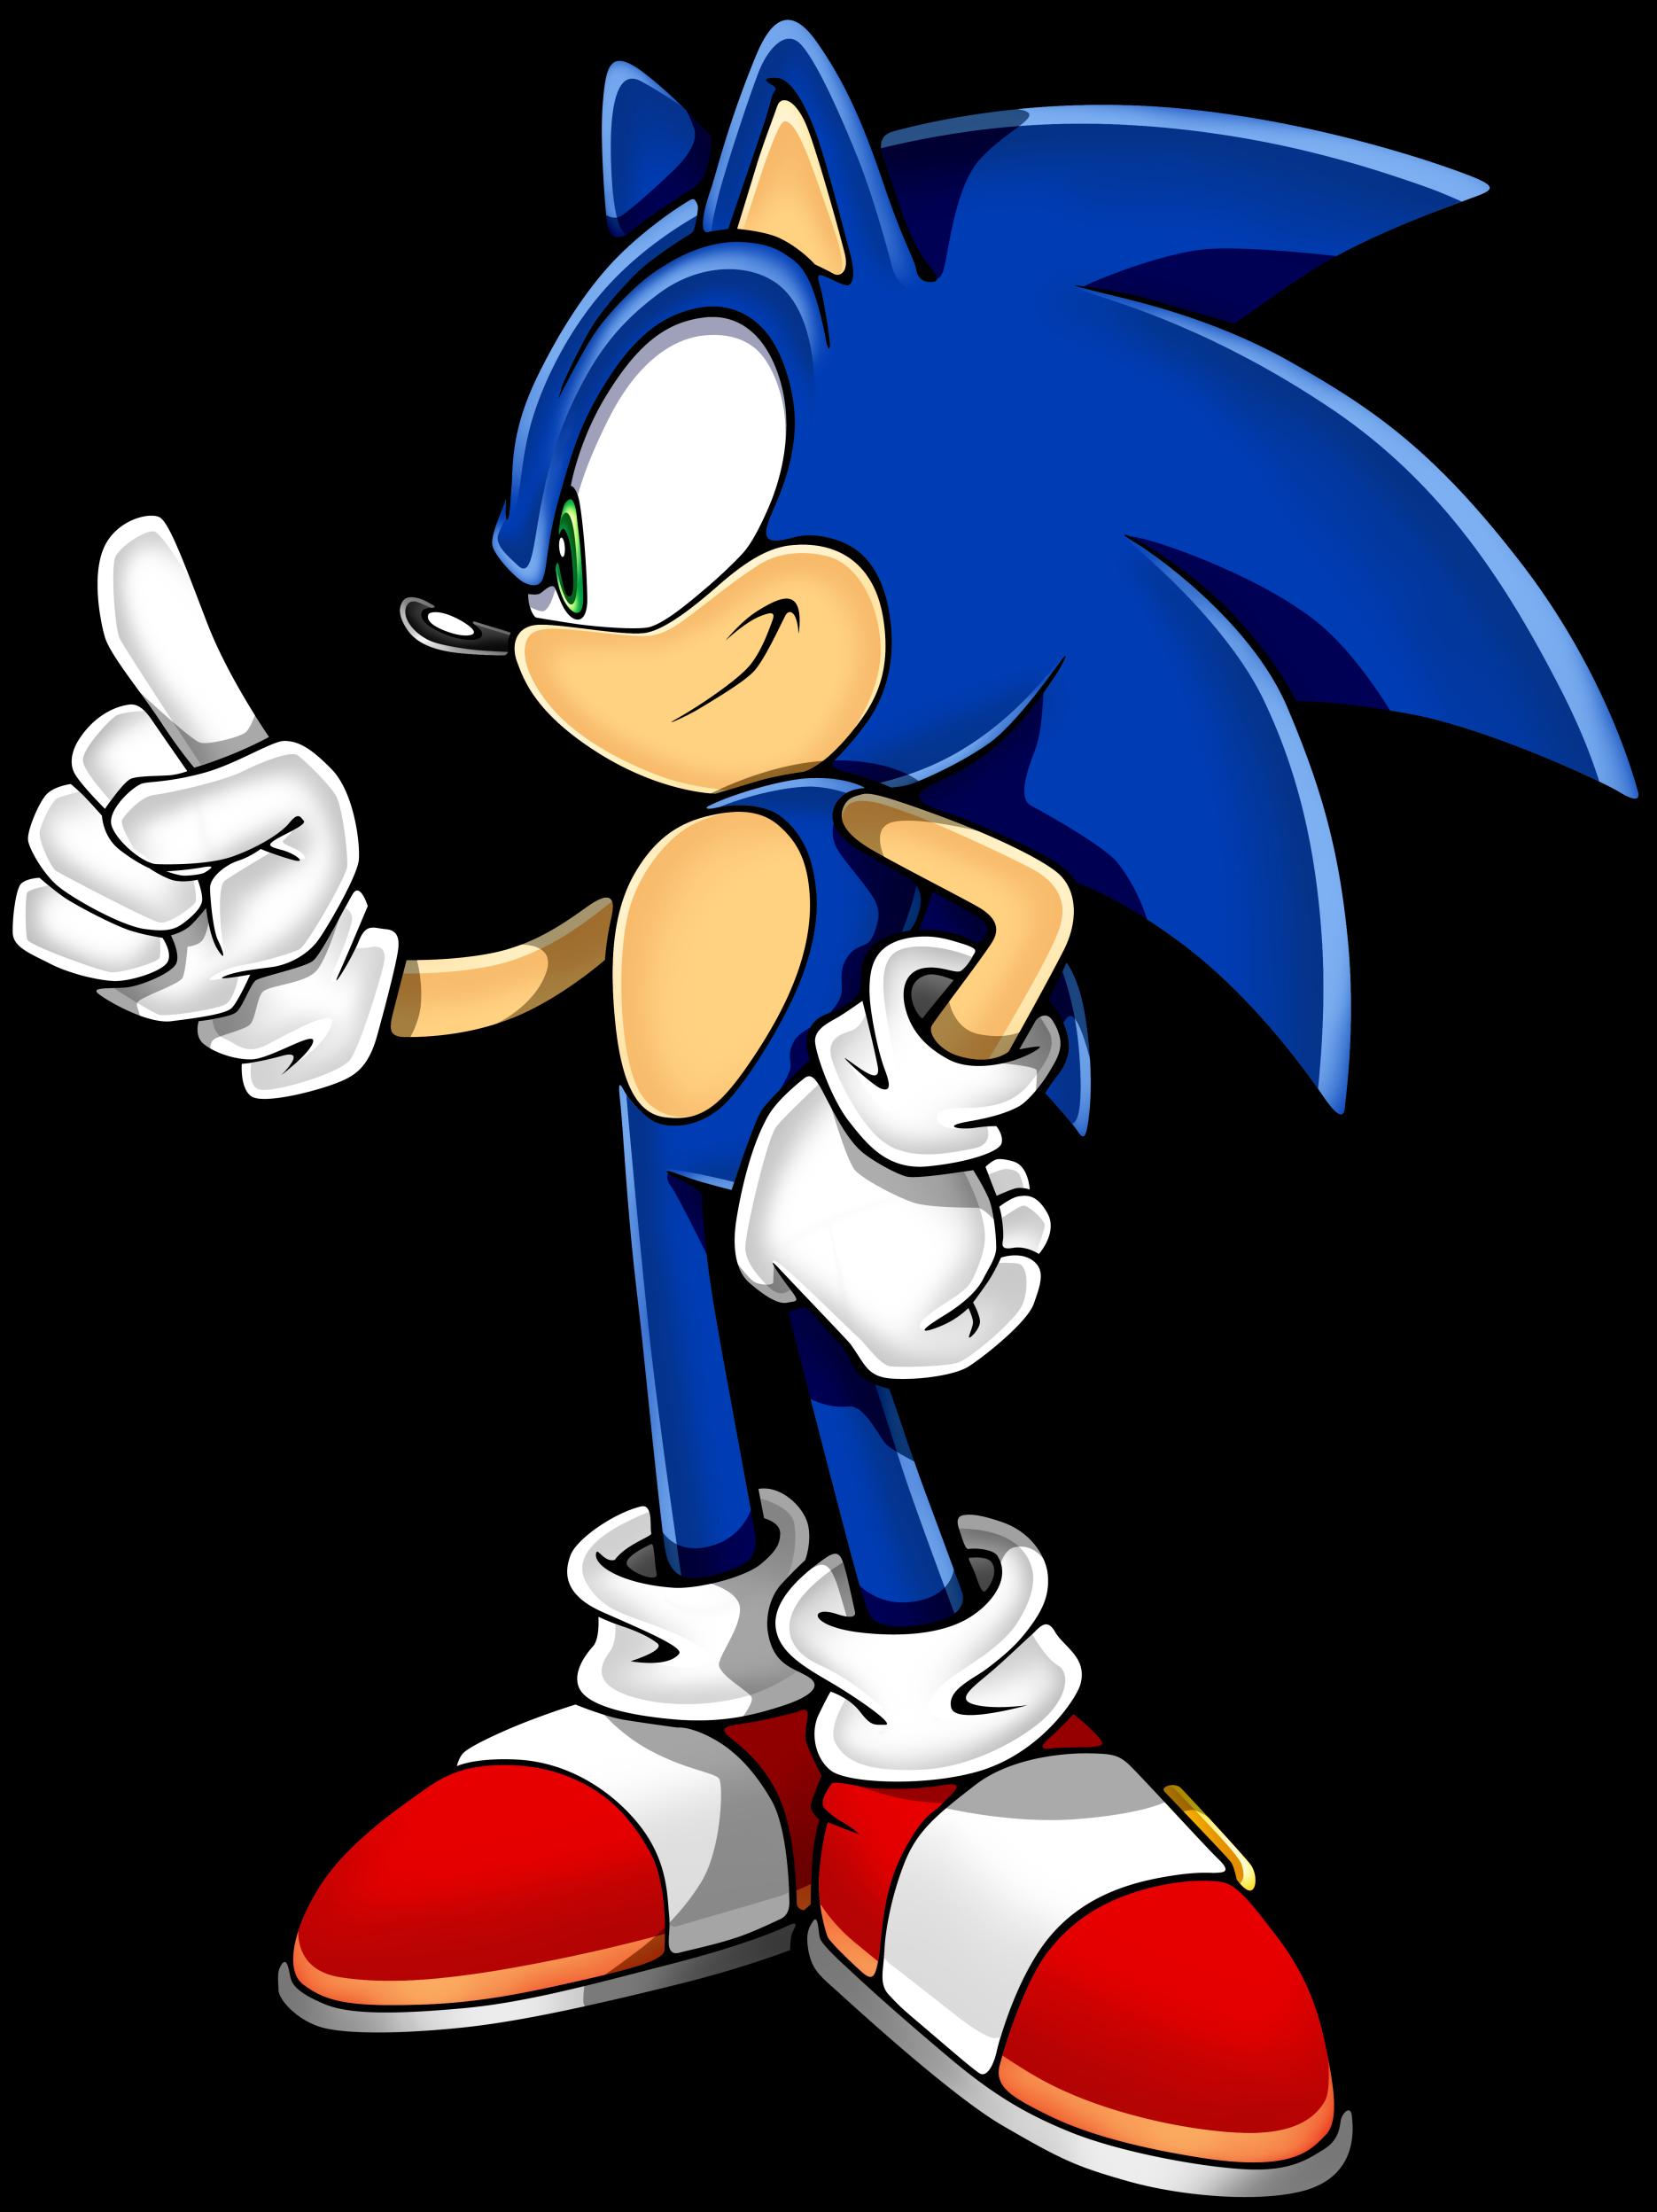 Gallery » Official Art » Sonic the Hedgehog » Sonic Art Assets DVD